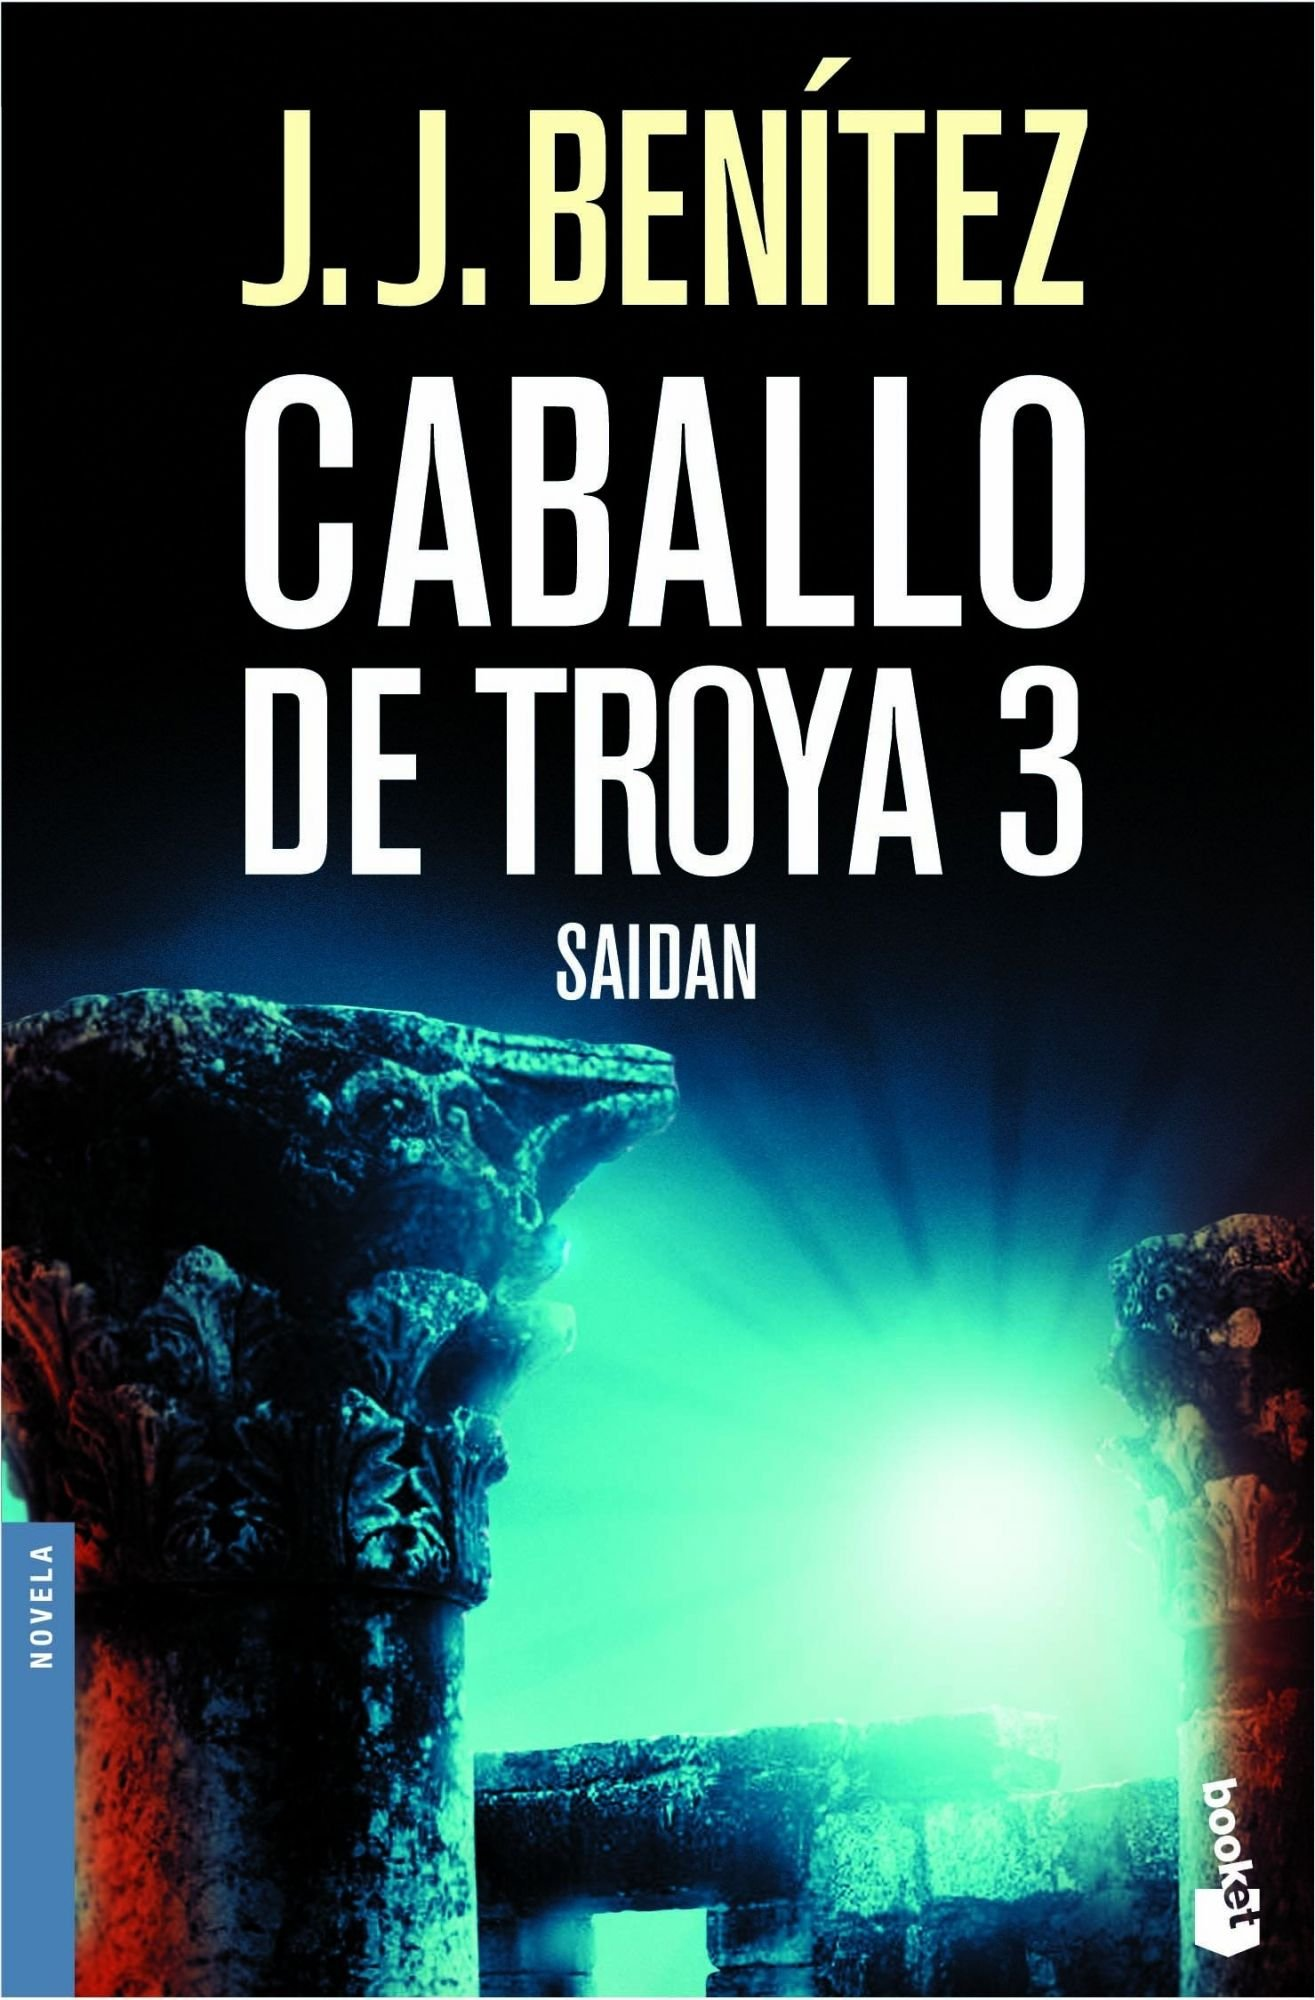 Caballo De Troya 3: Saidan (Spanish Edition) pdf